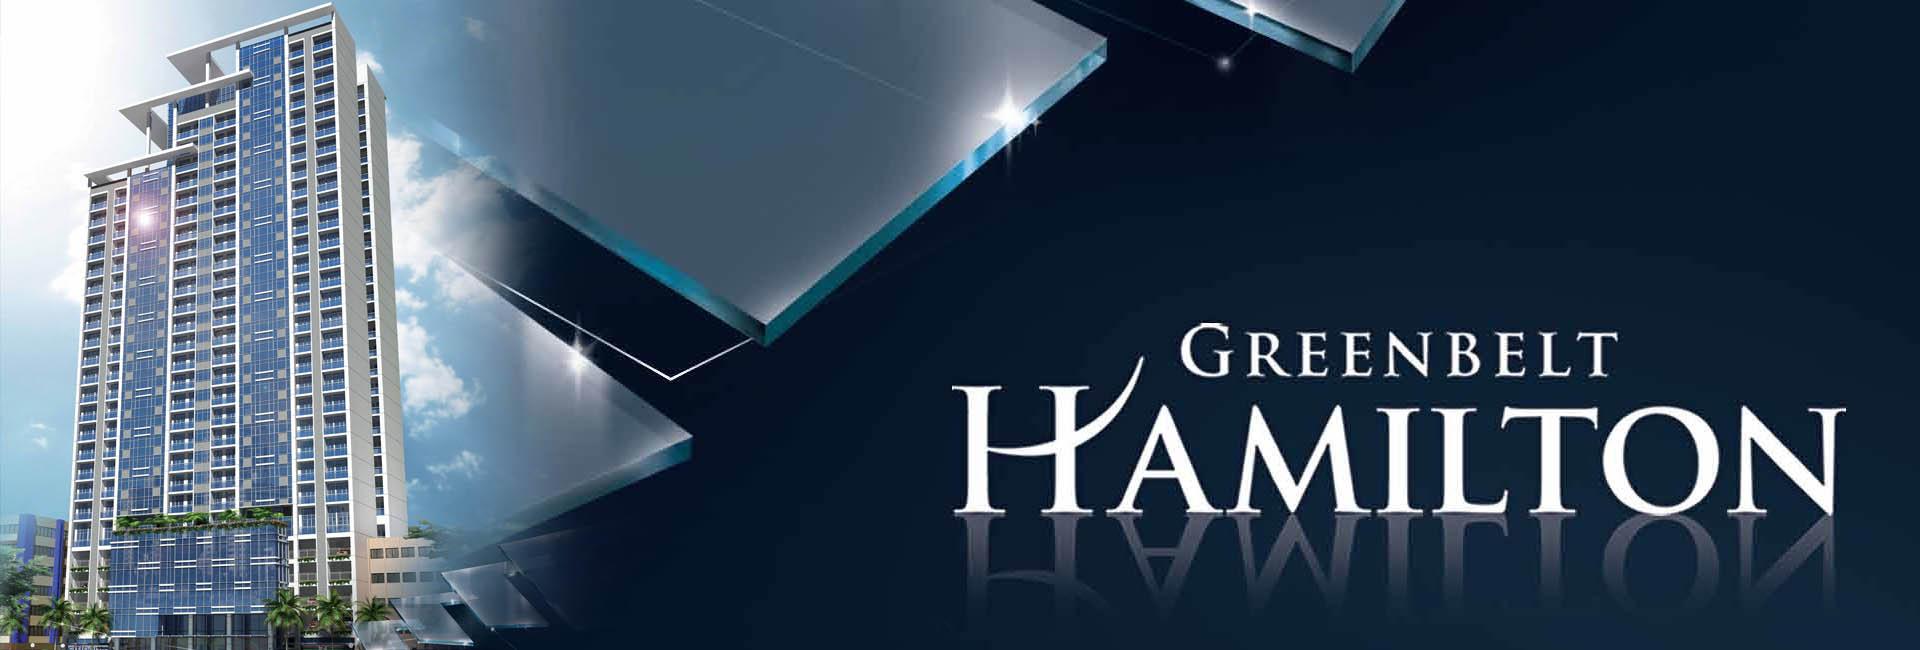 Greenbelt Hamilton Makati